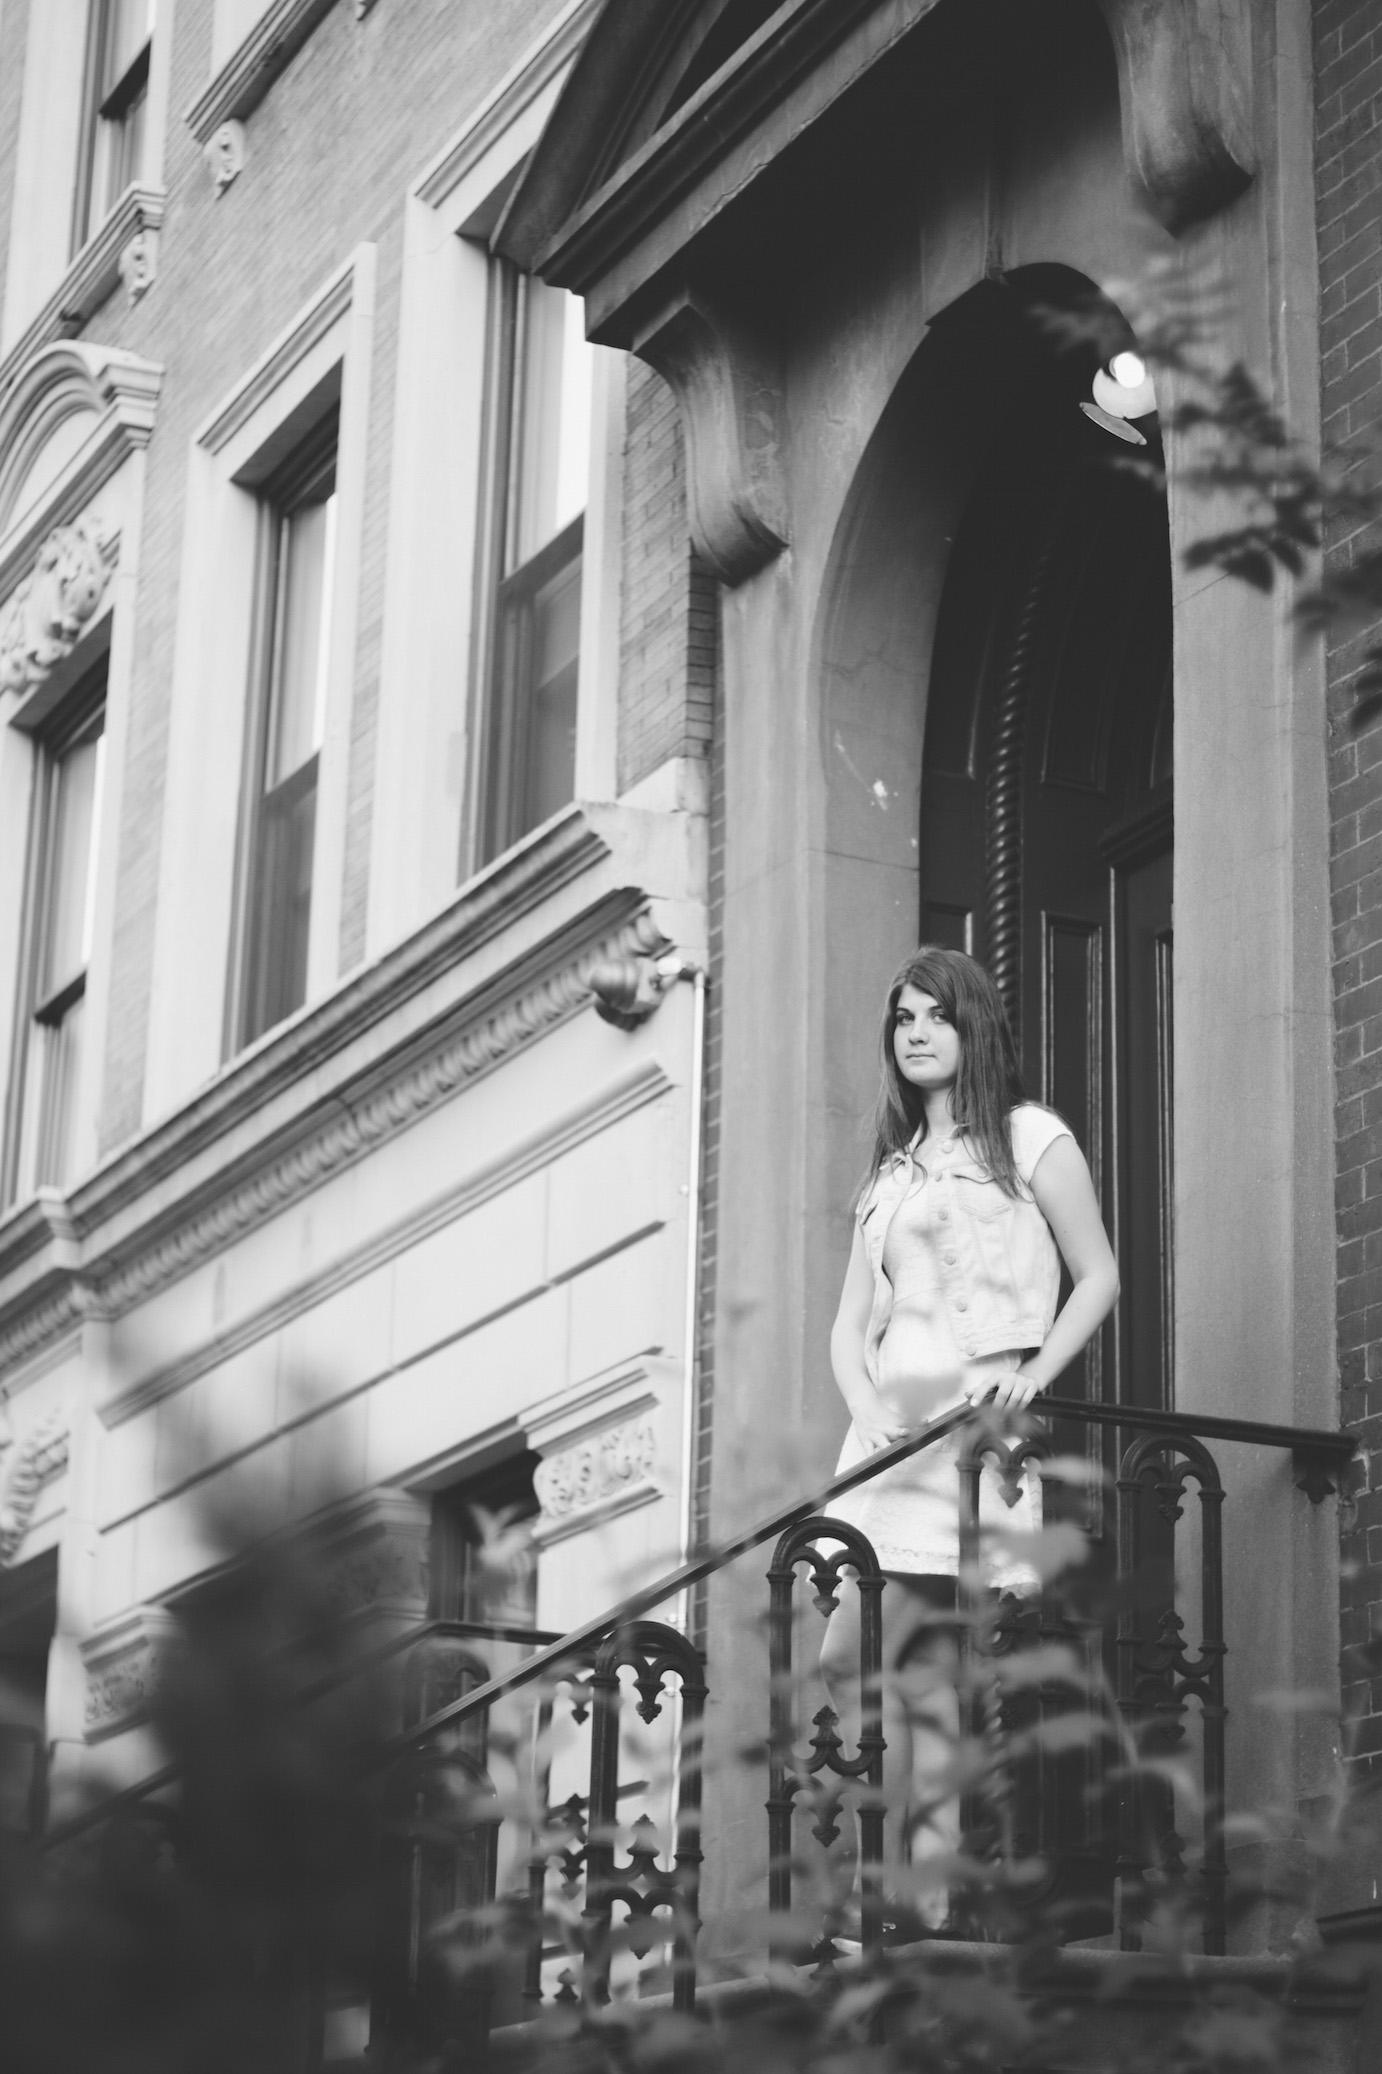 katya senior photography brownstone chelsea denim white dress irra korrelat walksmilesnap new york.jpg